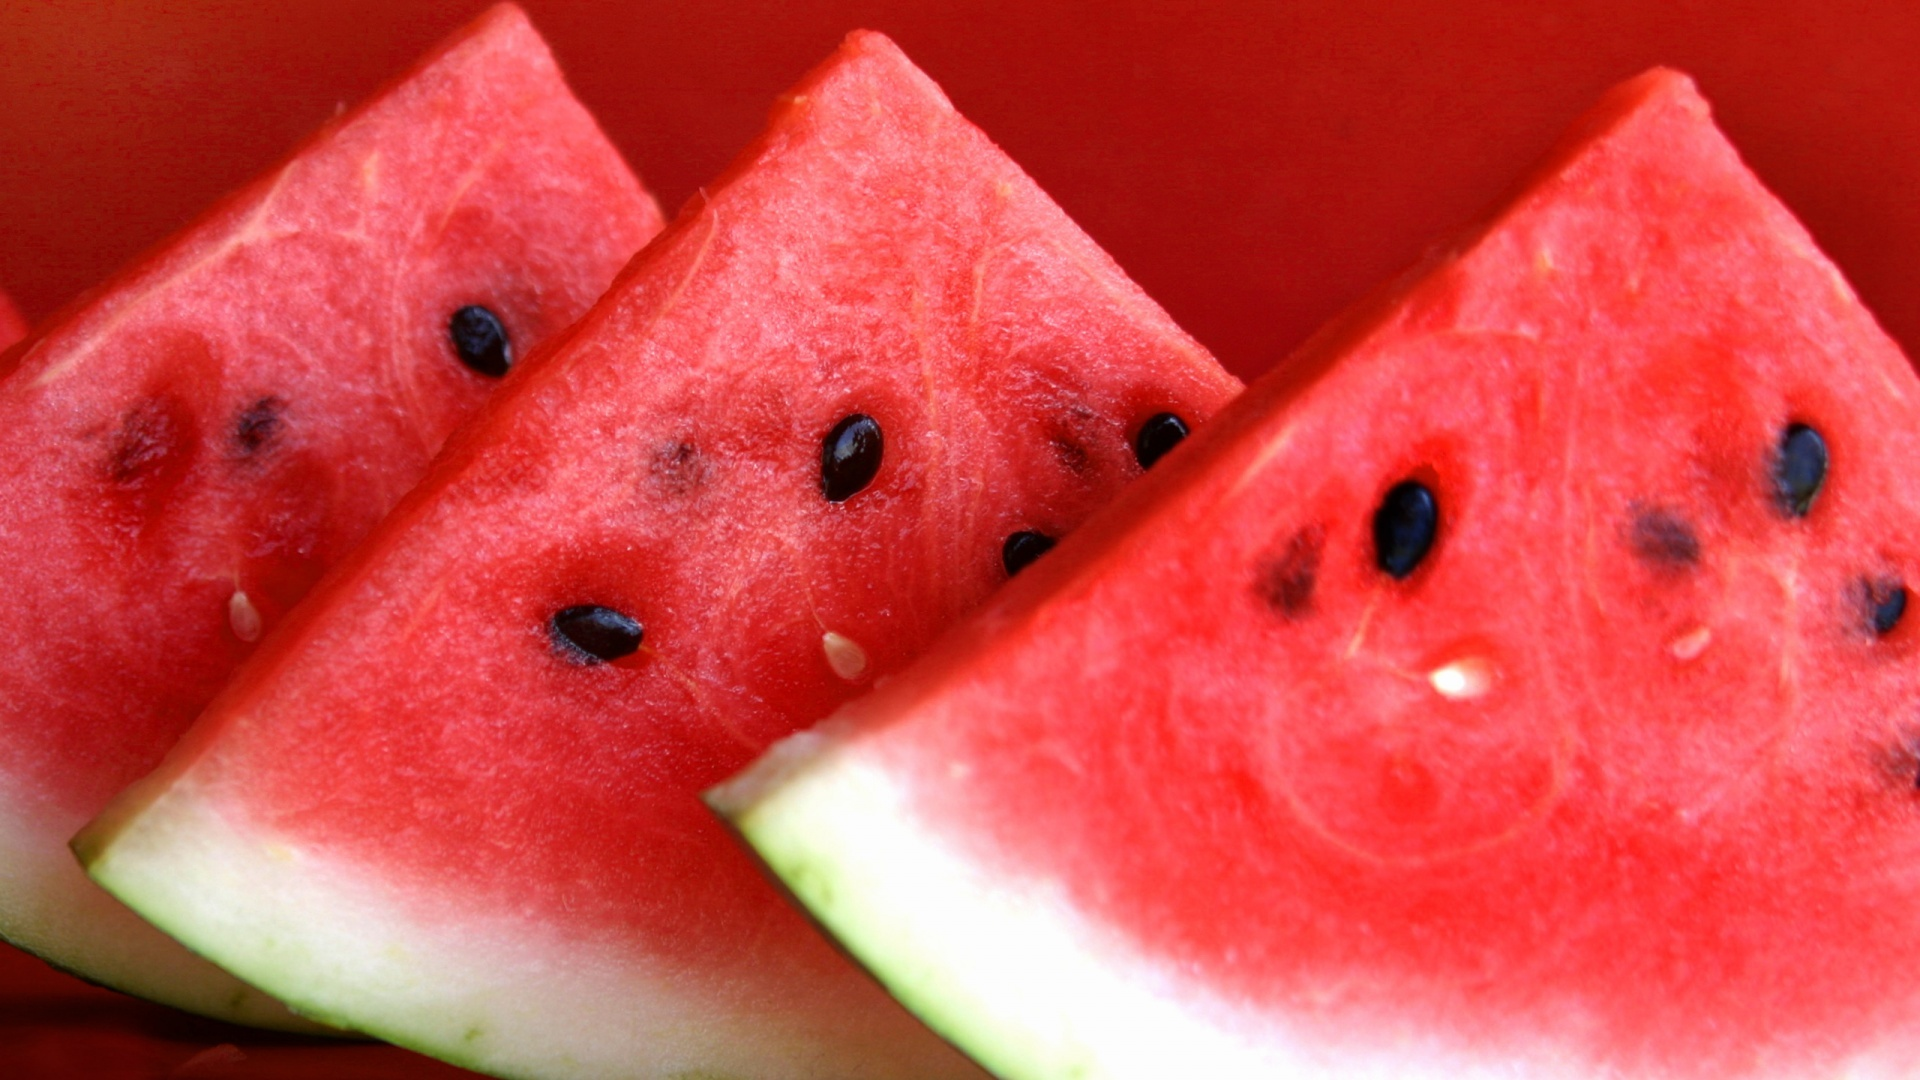 Watermelon 1920x1080 wallpaper